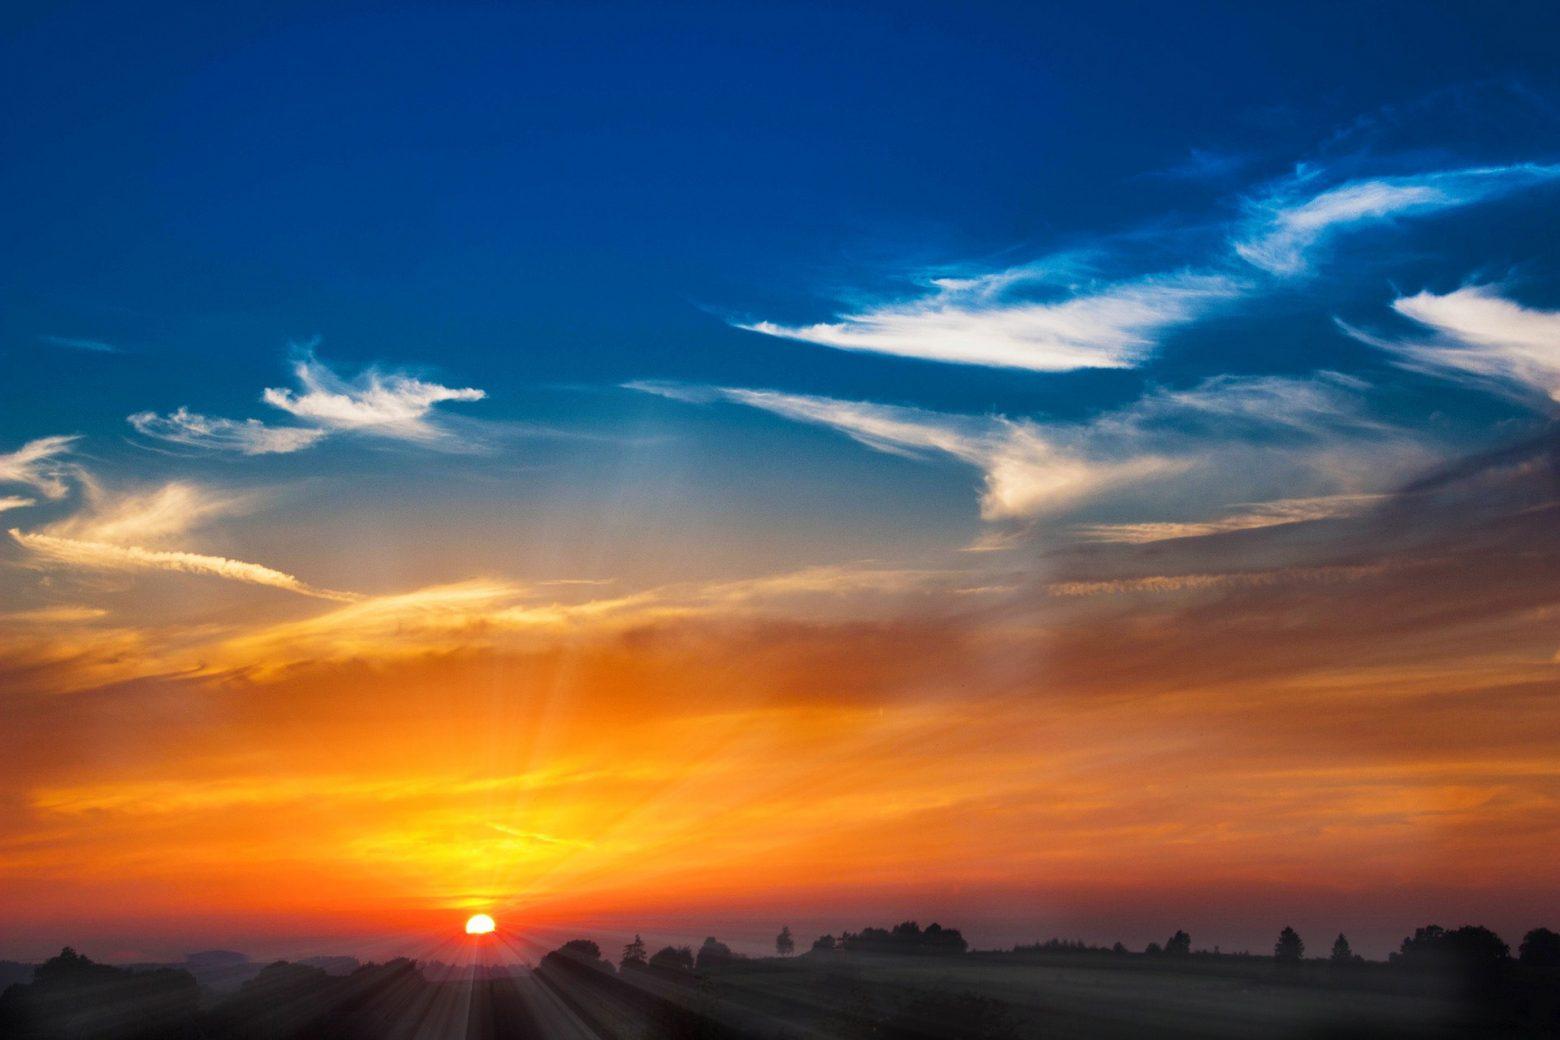 sunset-1626515